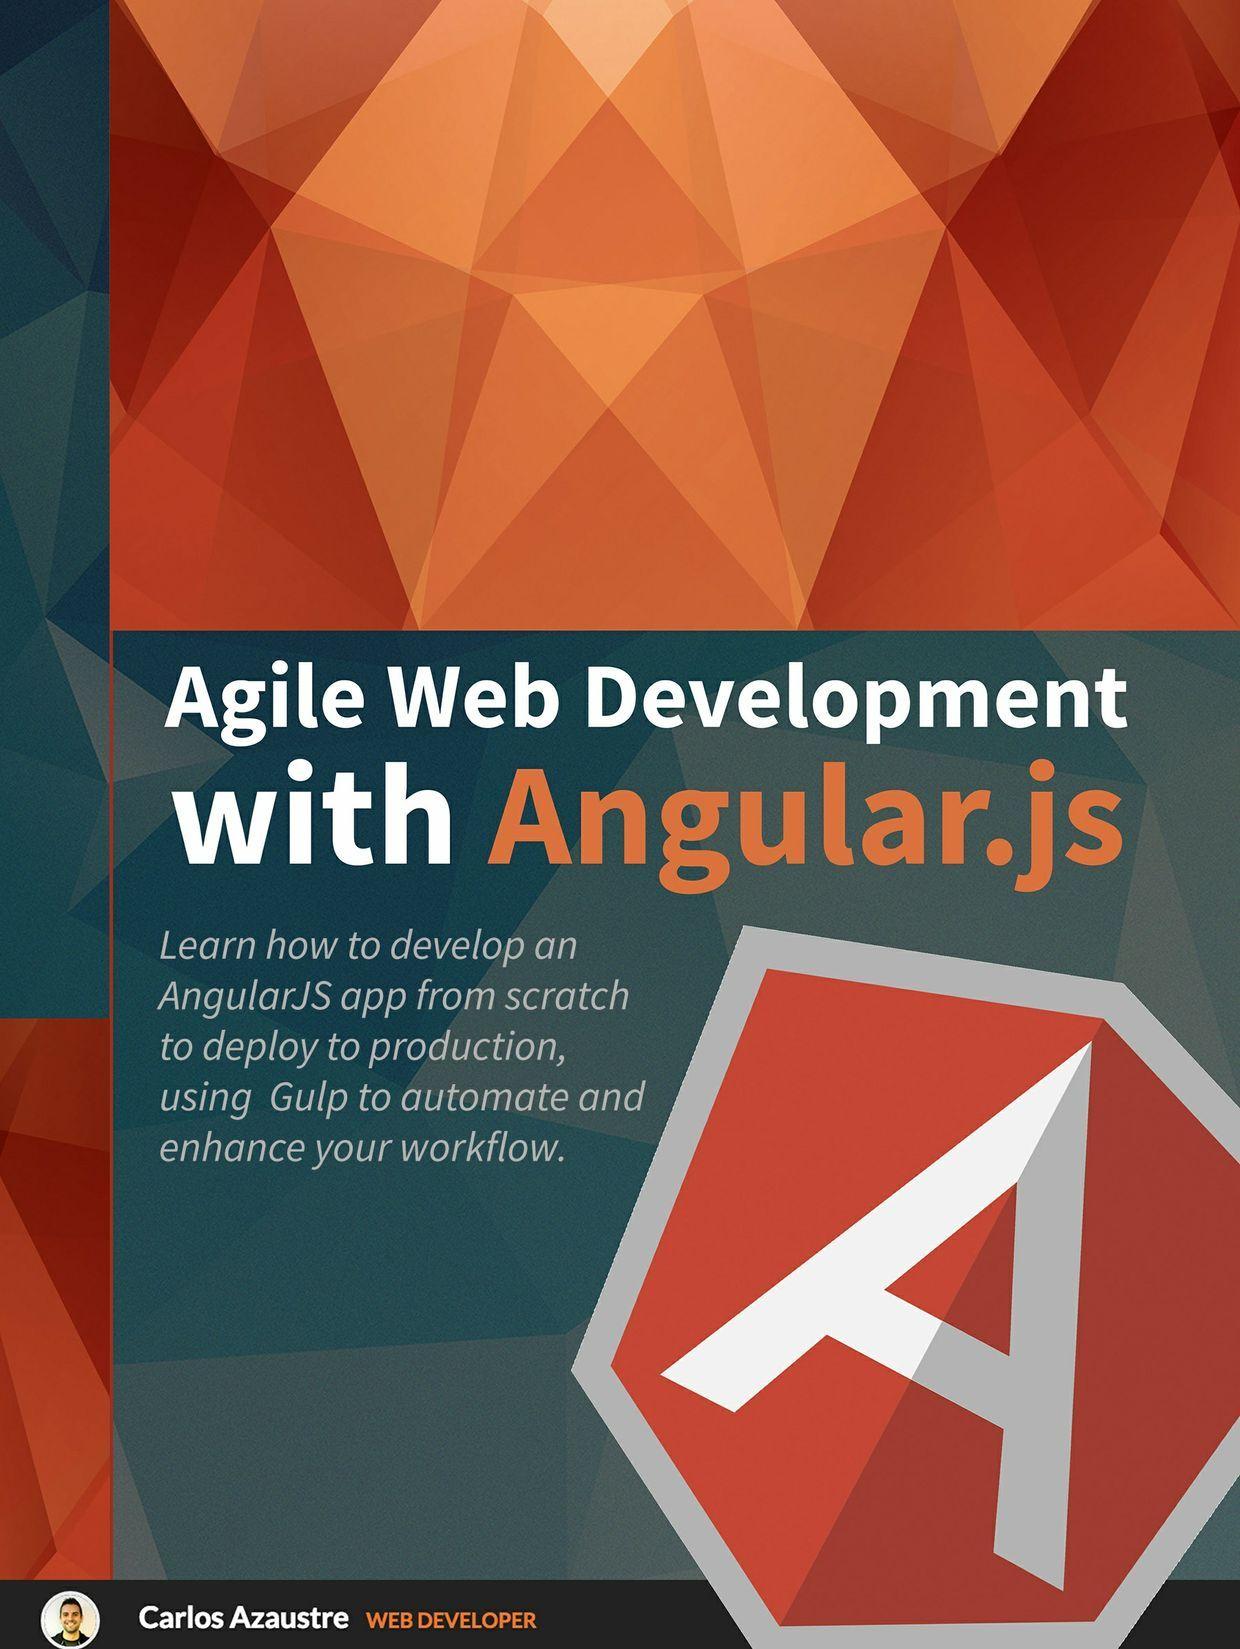 Agile web development with AngularJS and GulpJS   books   Pinterest ...